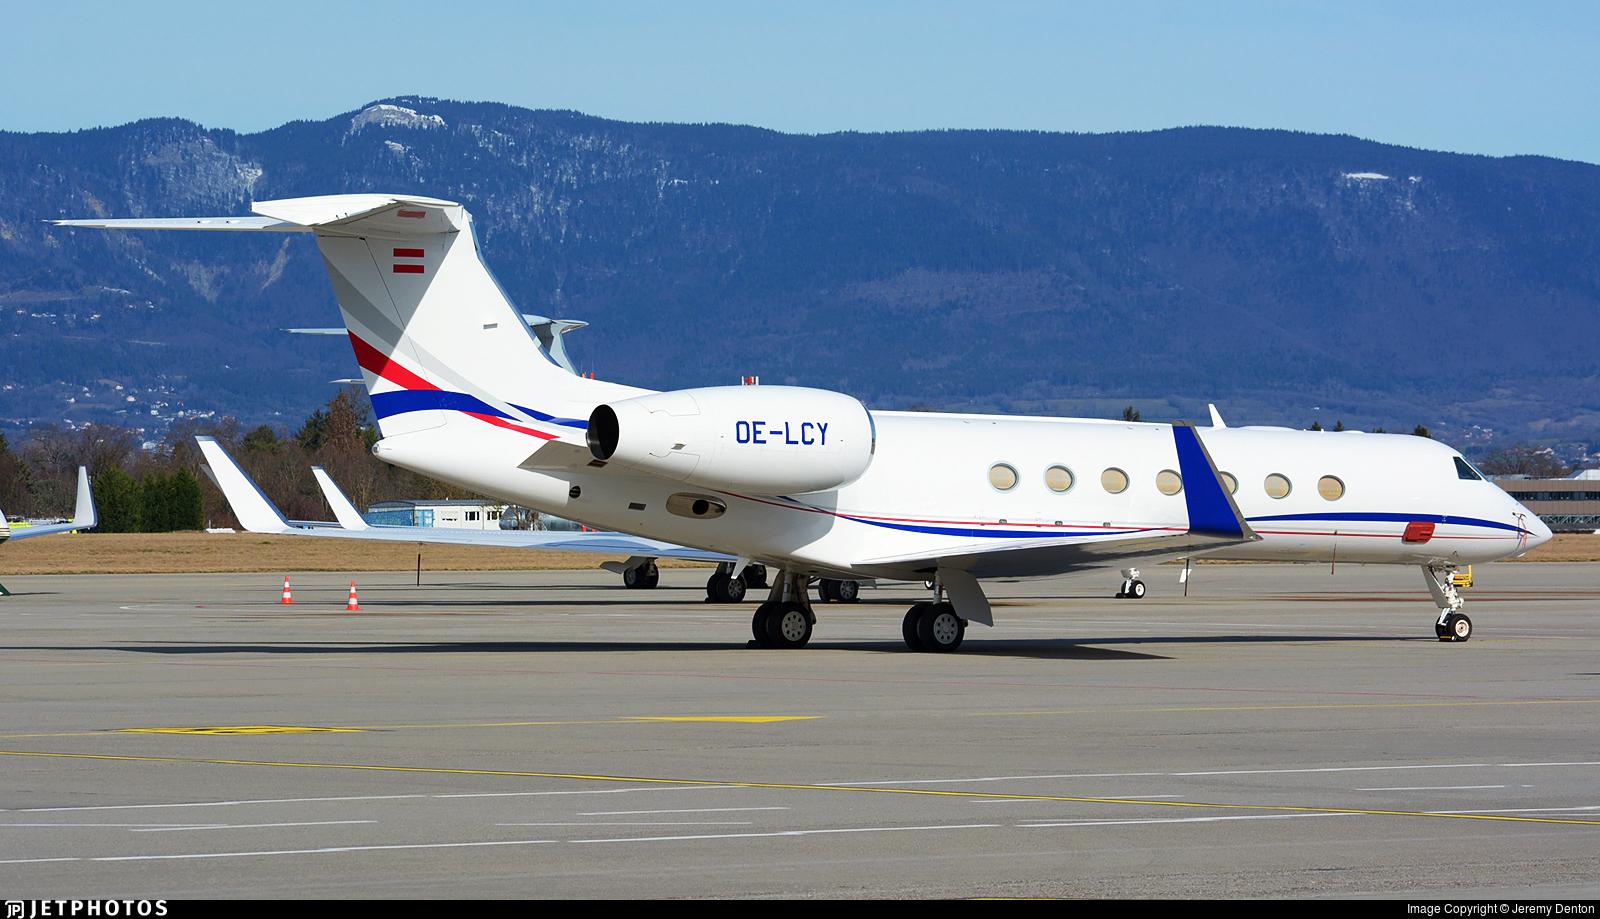 OE-LCY - Gulfstream G550 - Private